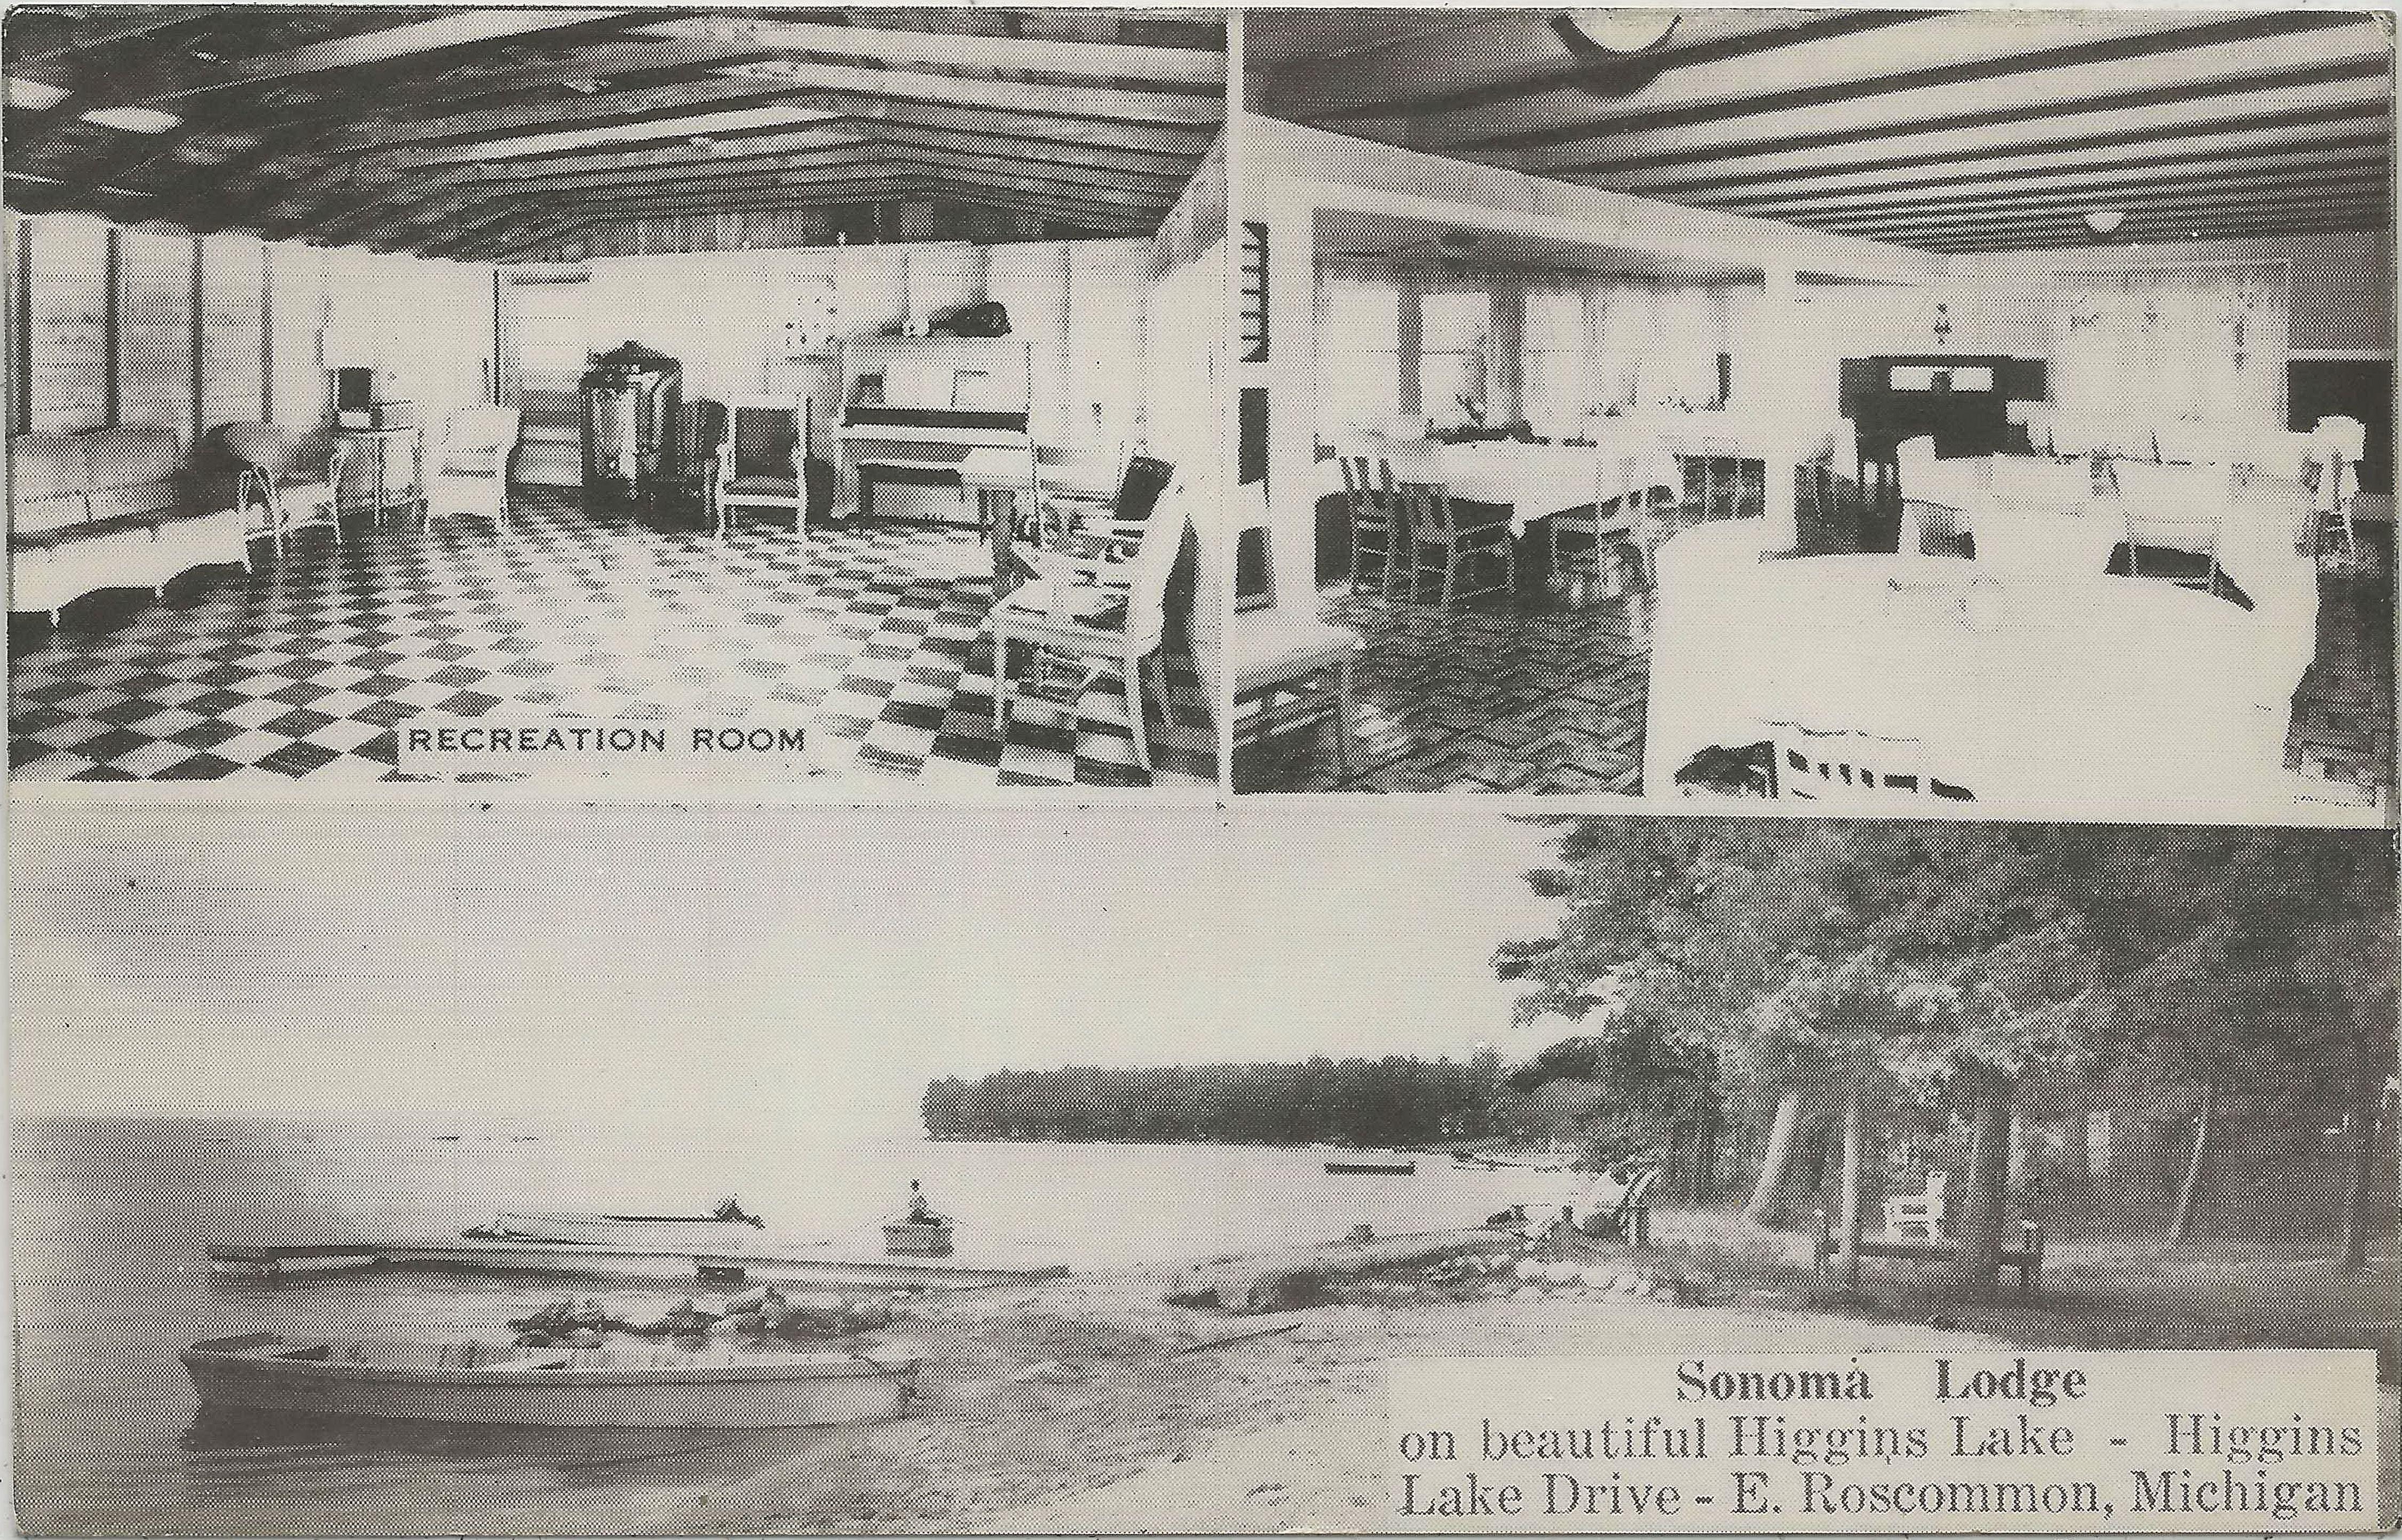 NE Roscommon Higgins Lake MI 1950s Higgins Lake SONOMA LODGE Vacation Resort FUN on Higgins Lake Your Resort Hosts Owners PAUL & HELEN LIPPERT 3 #upnorthmemories